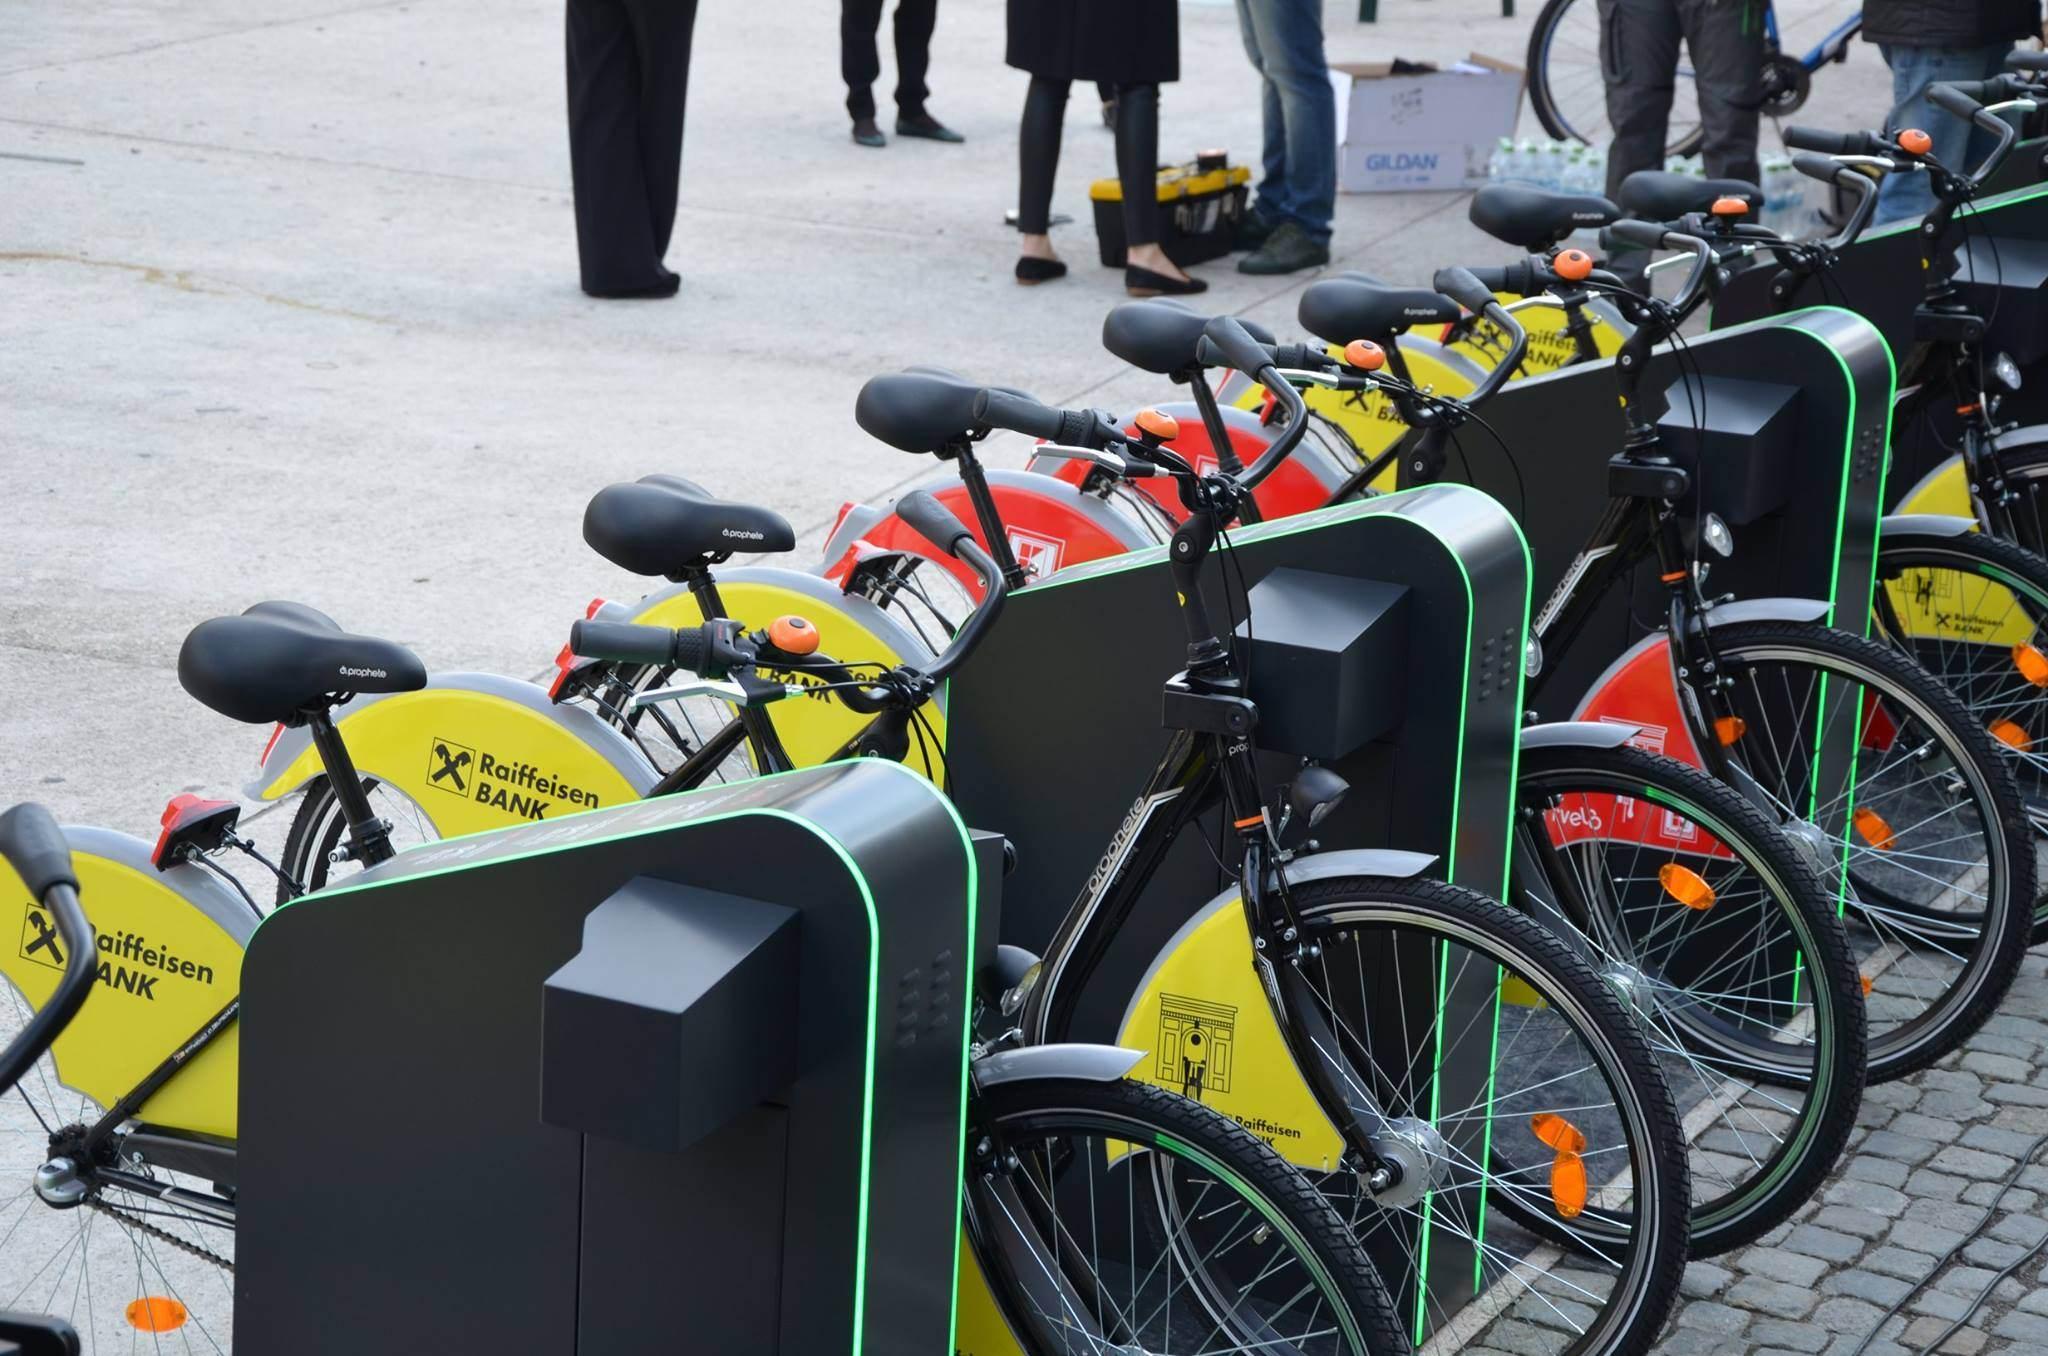 In sfarsit, bike-sharing automatizat in Bucuresti. S-a lansat I'Velo Urban